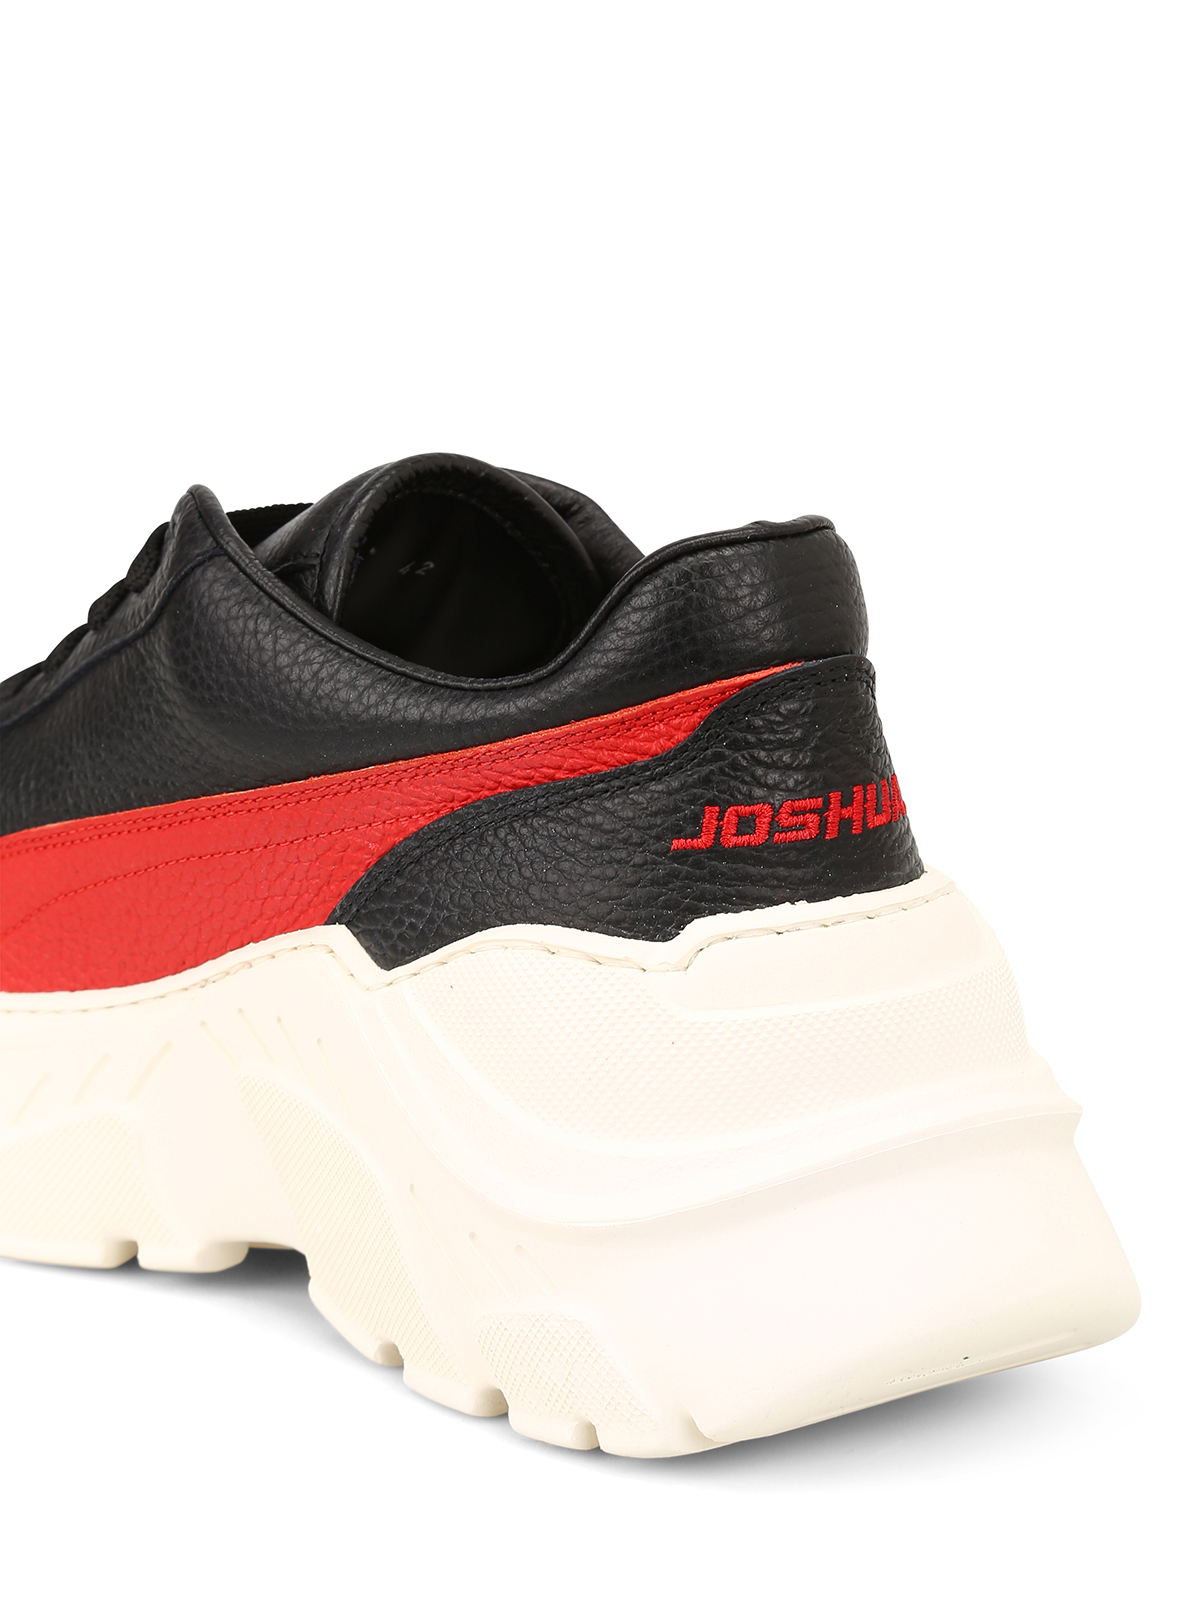 Joshua Sanders ZENITH FLIRT - Trainers - black/red RNaNTMe9